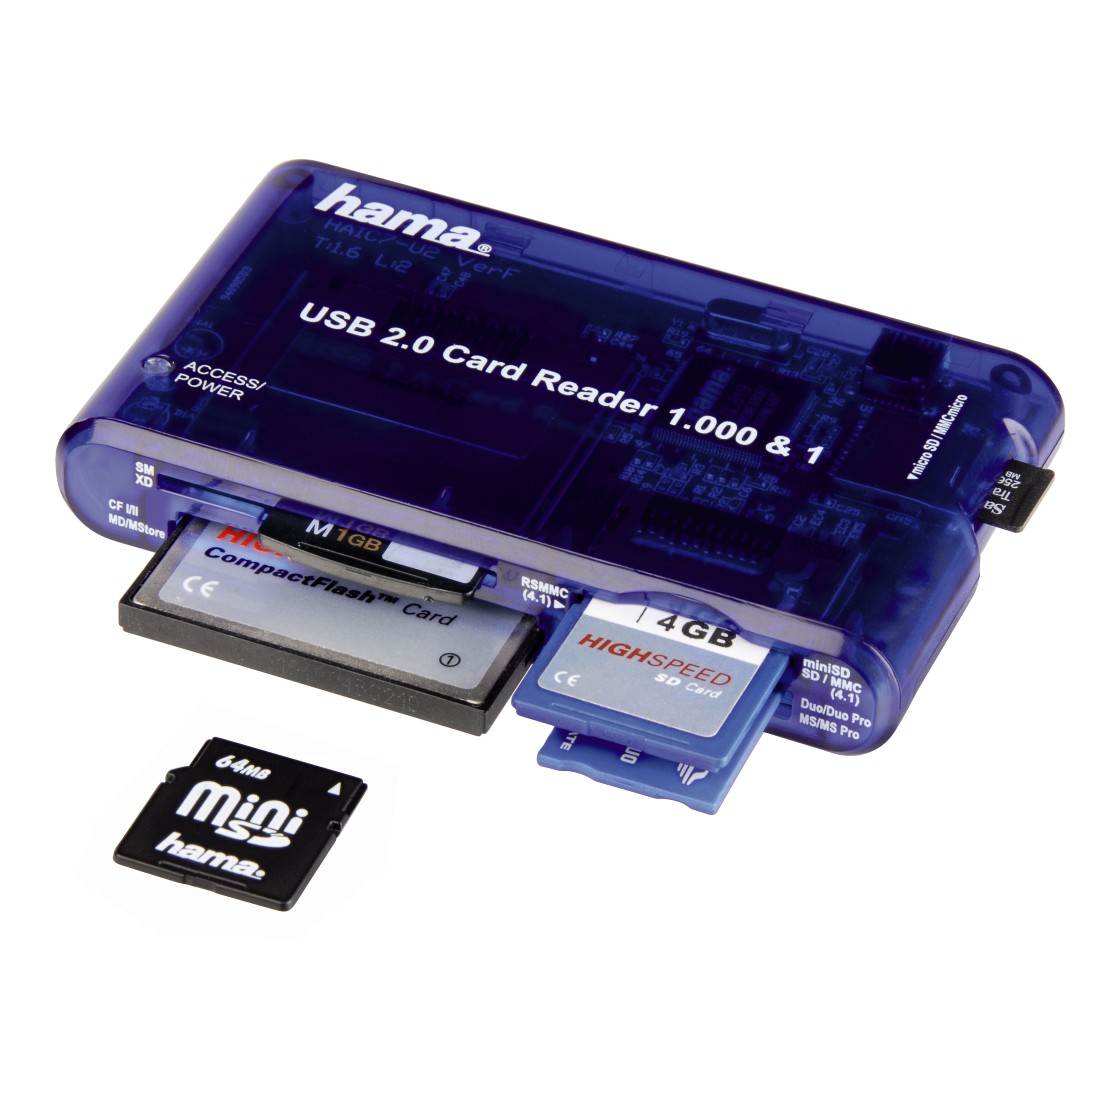 00055350 hama 1000 1 usb 2 0 multi card reader sd